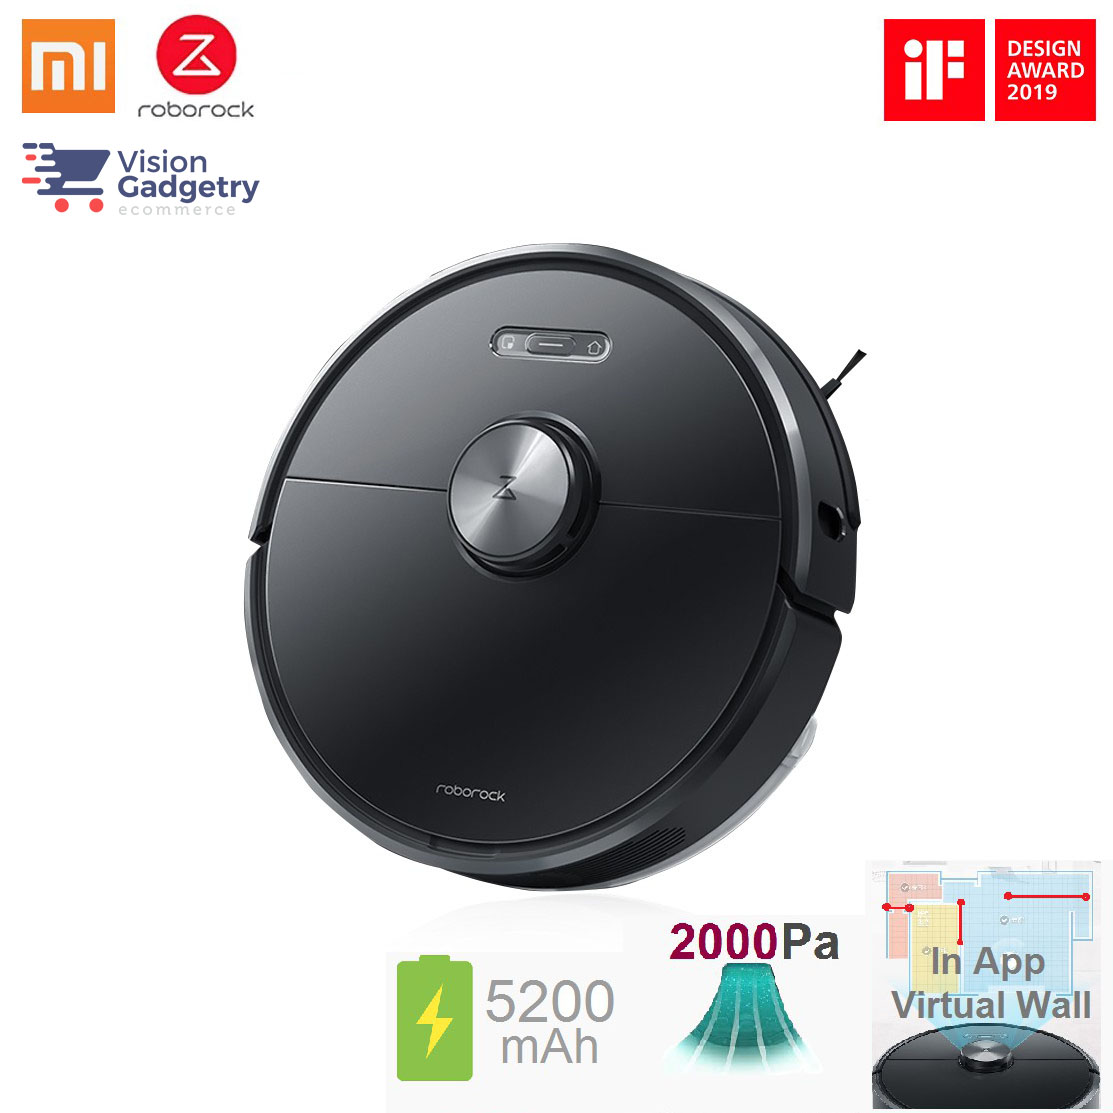 Xiaomi Roborock T6 Smart Robot Vacuum Cleaner Mop Black Ready Stock